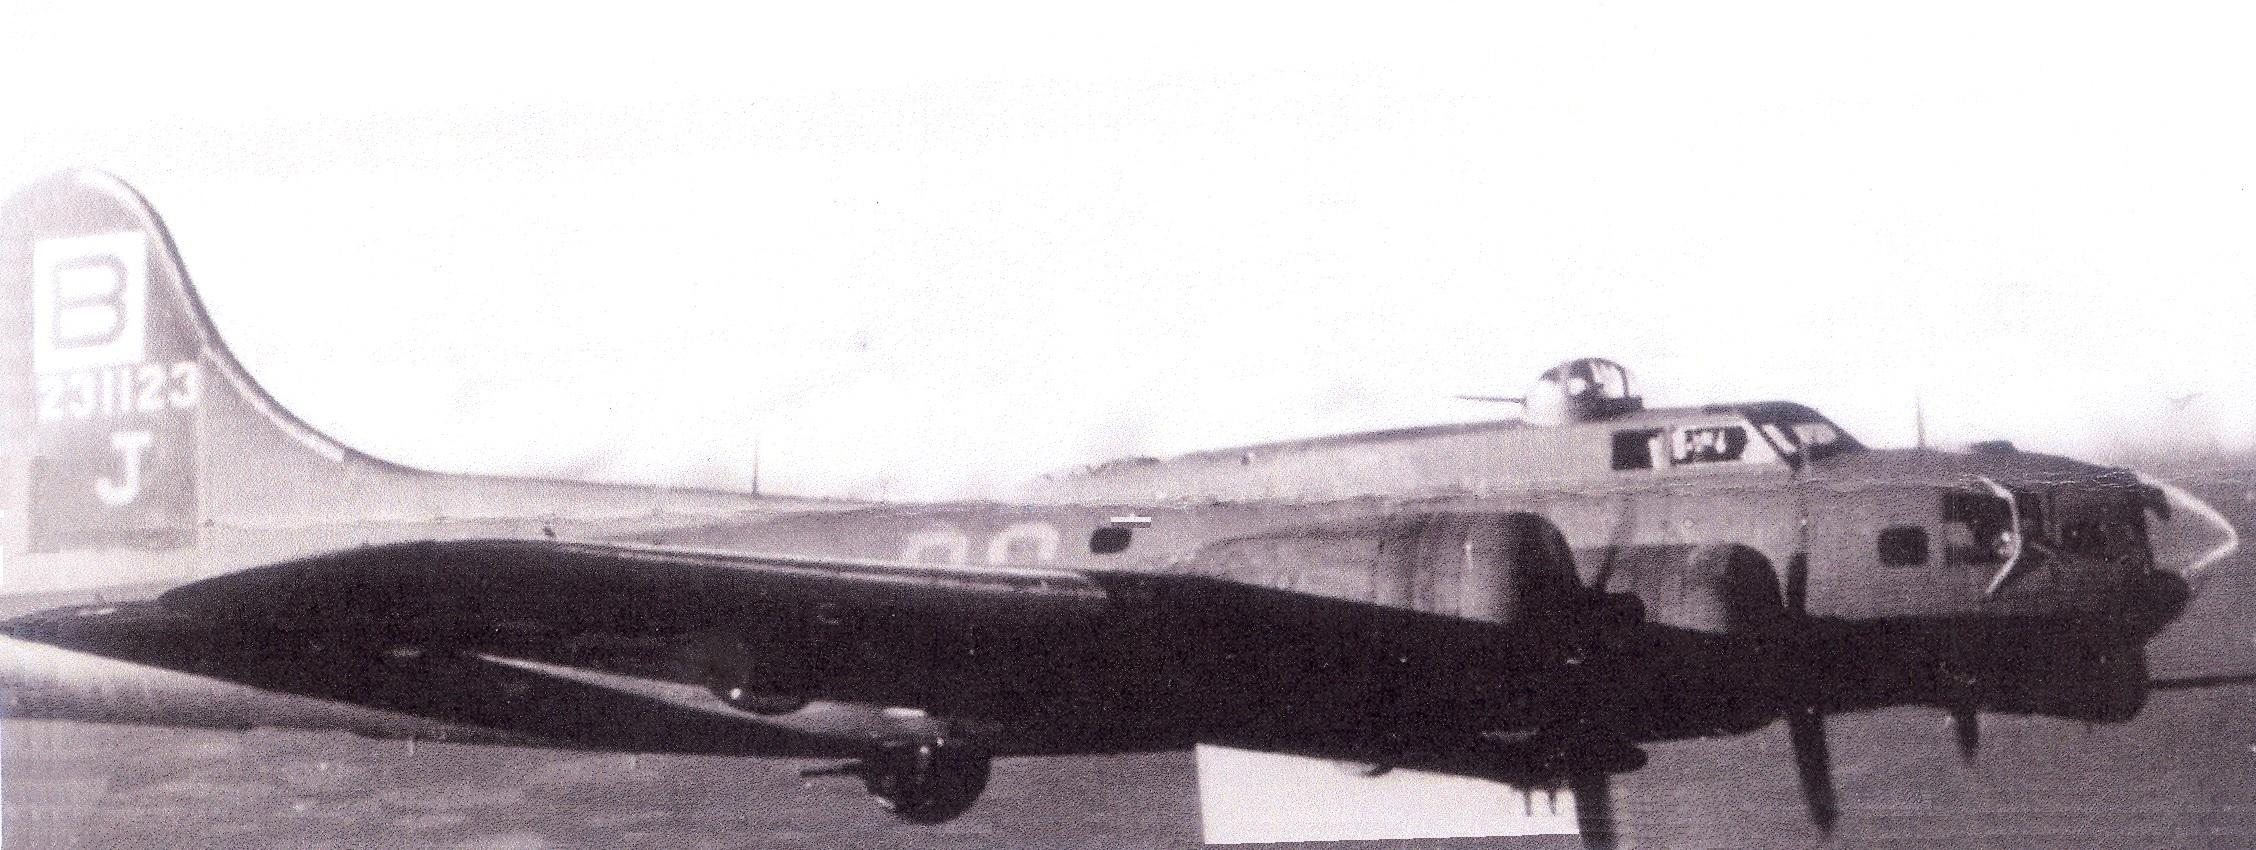 B-17 #42-31123